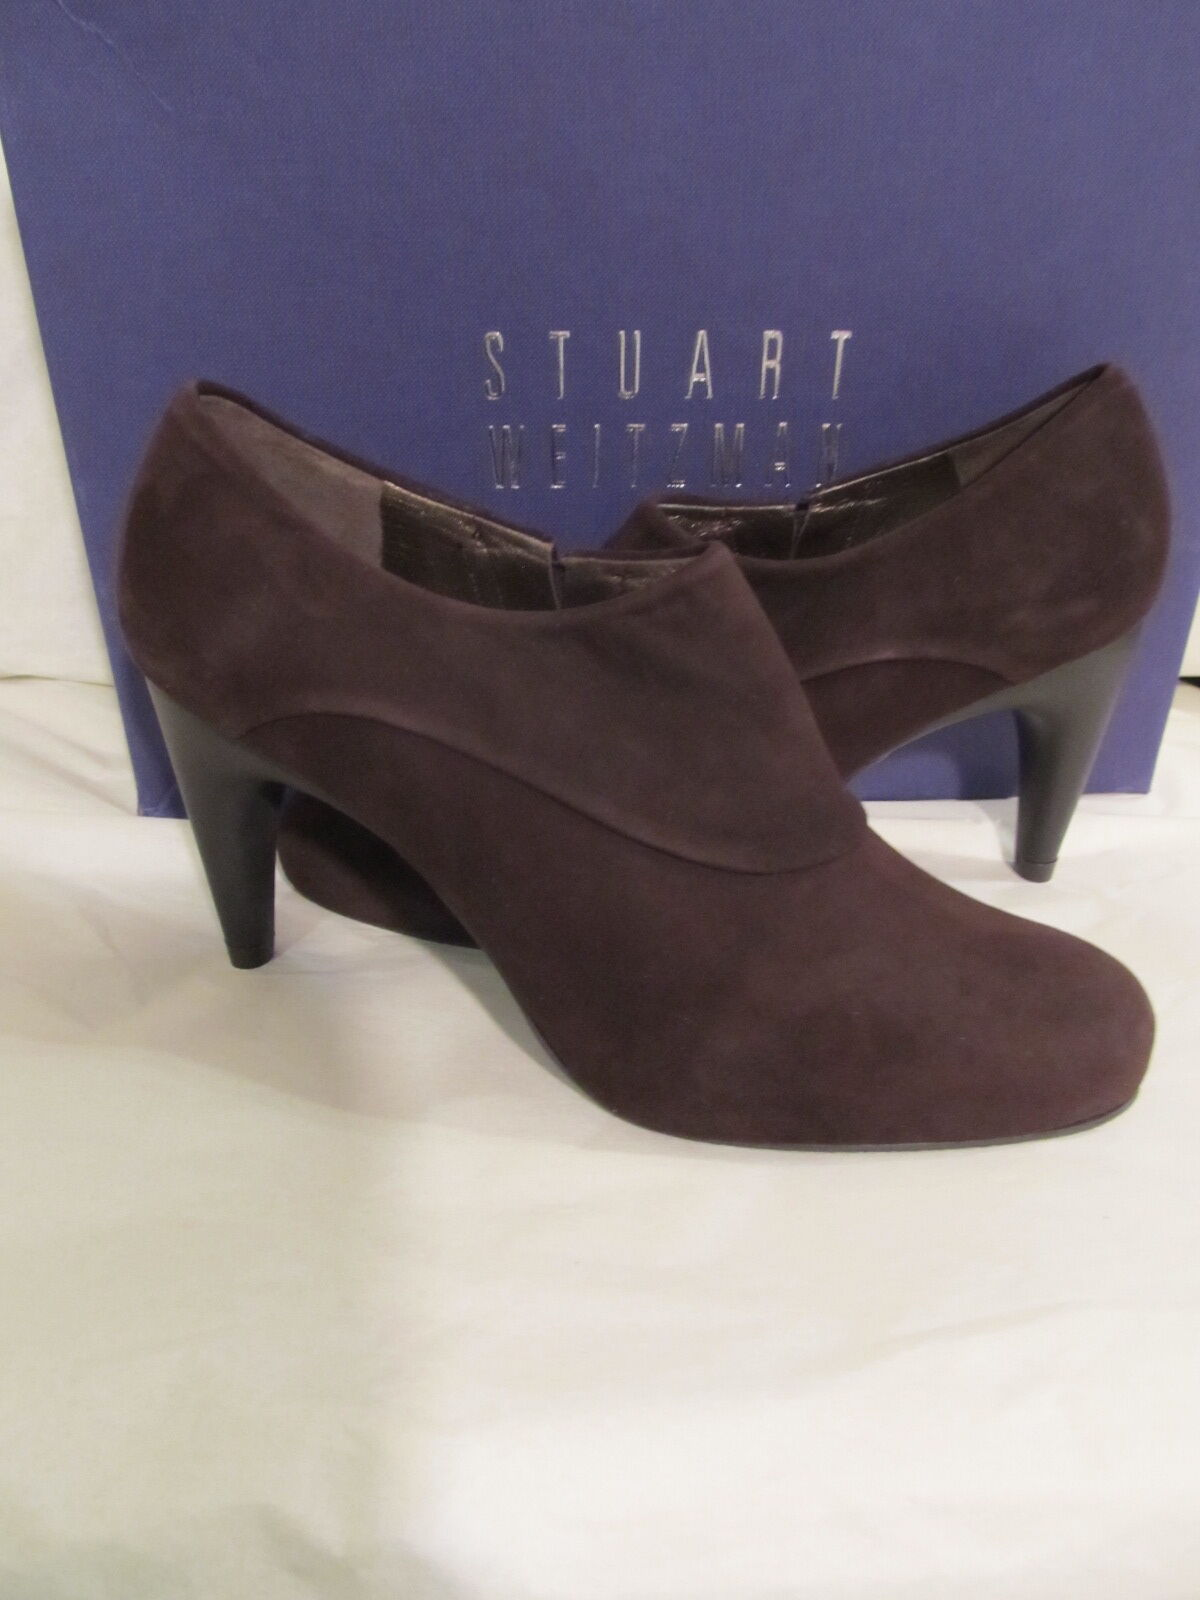 Stuart Weitzman para mujer Talla Talla Talla 7.5 elegante Cola Gamuza Marrón Botines Zapatos Tacón Alto 7461c2